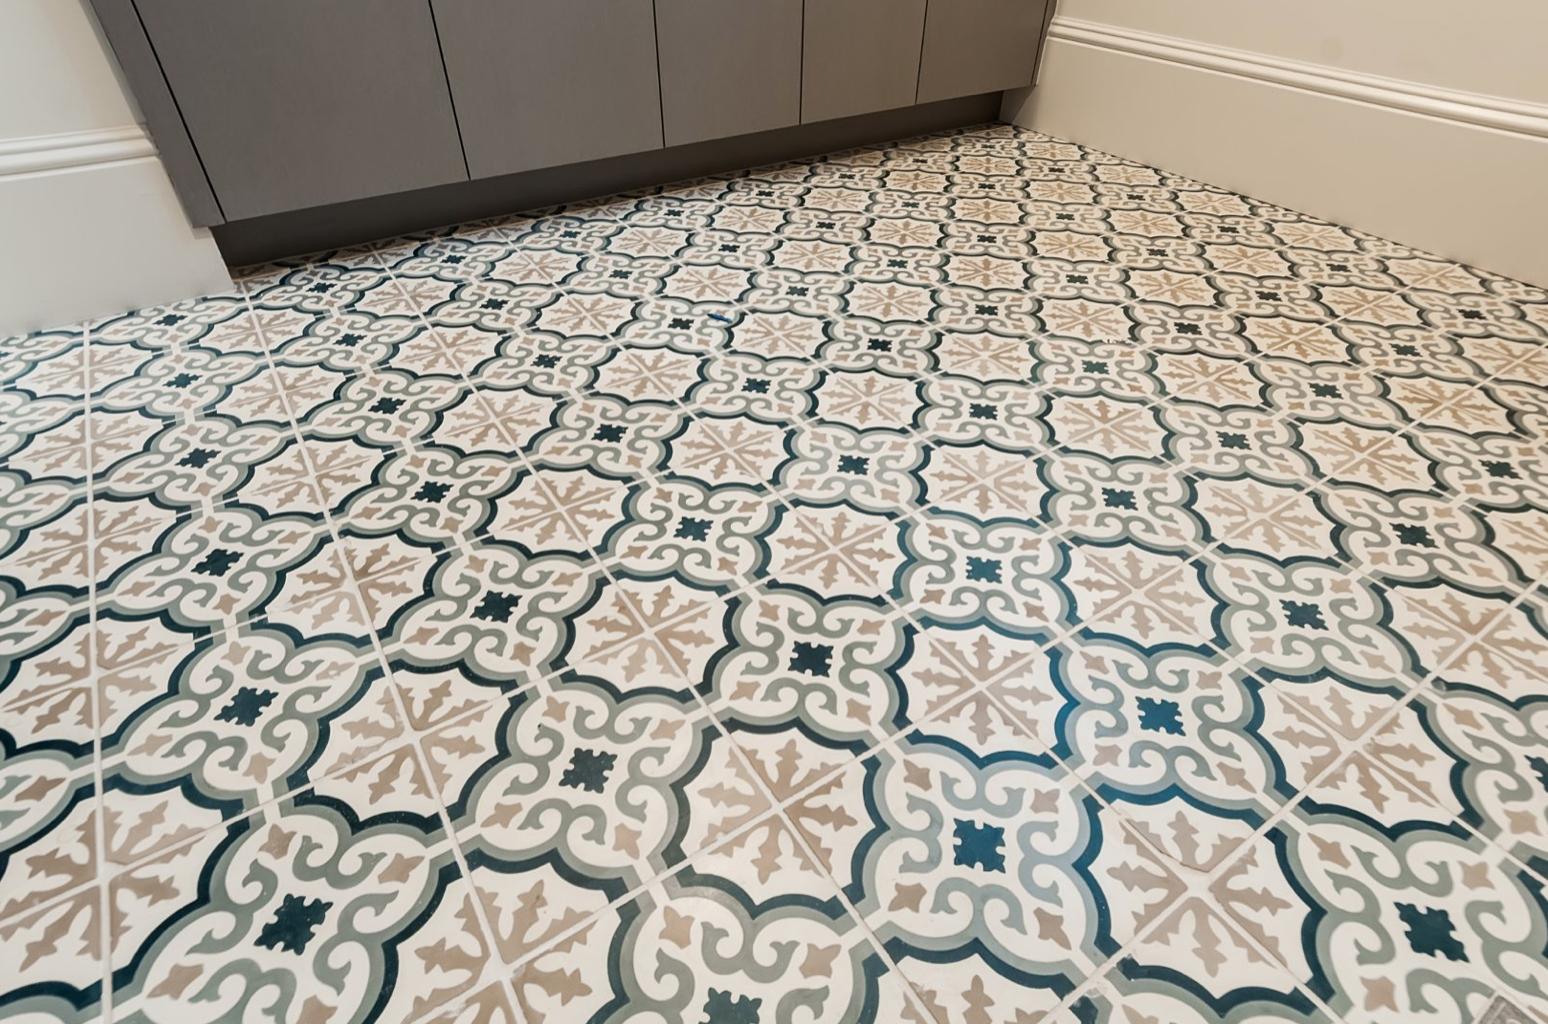 Non-Slip Flooring in Your Bathroom